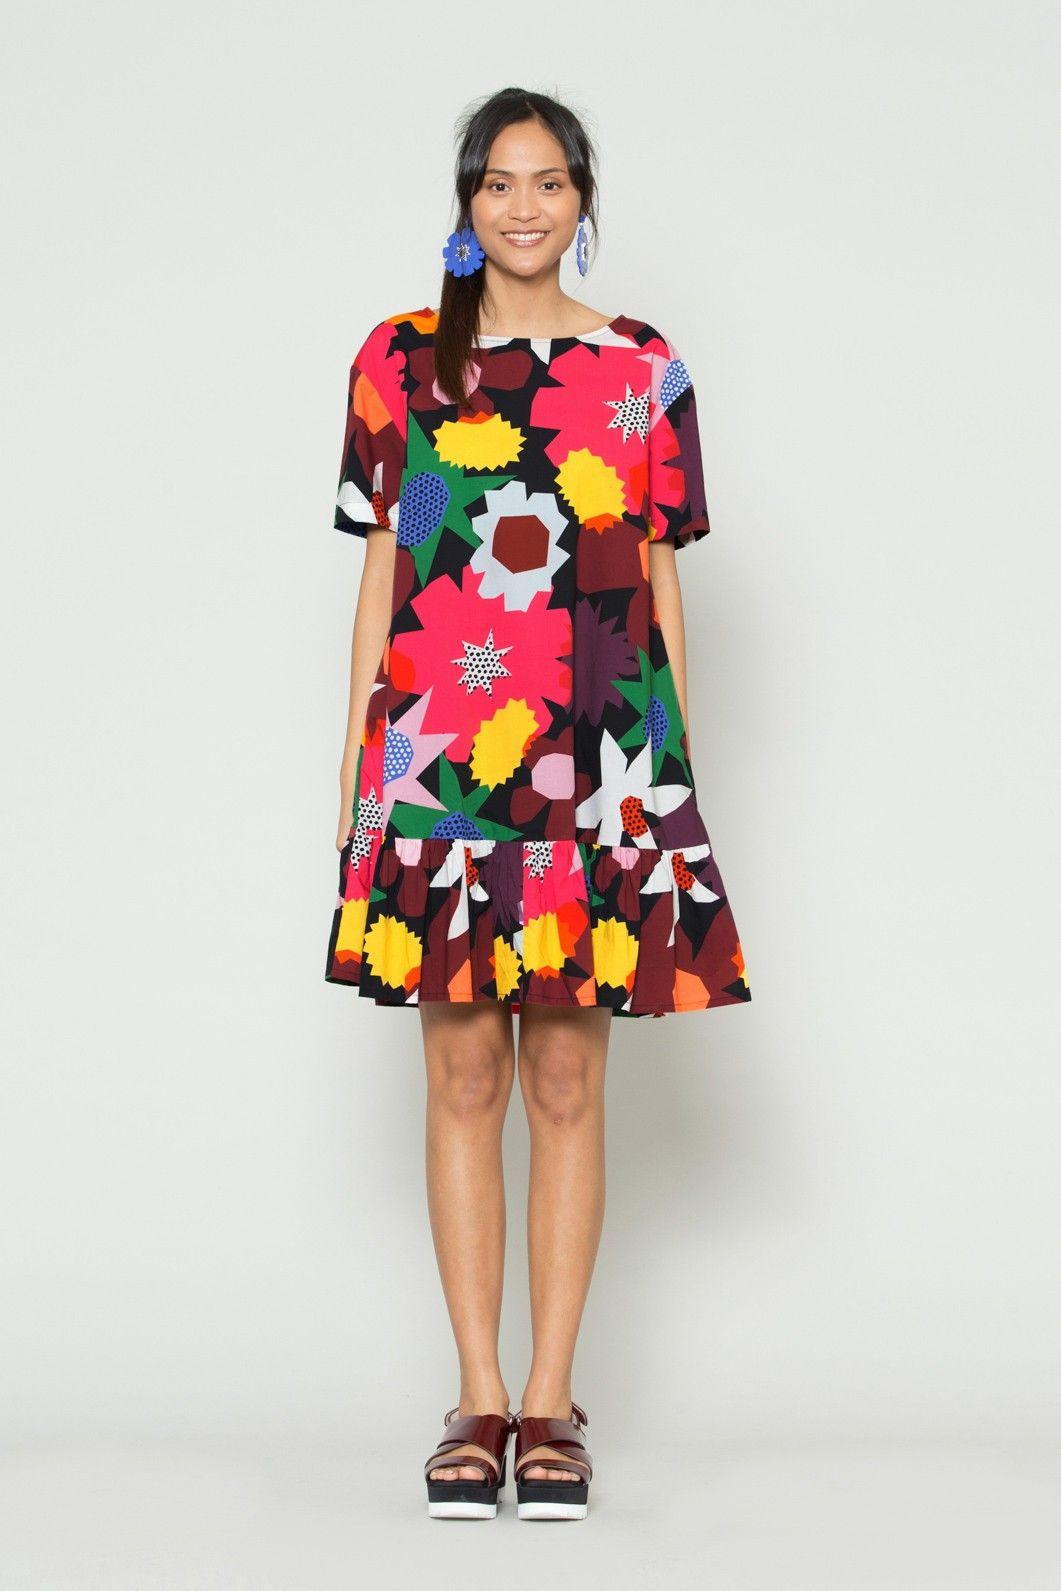 Banned Cherry Pop Dress - Dark Fashion Clothing